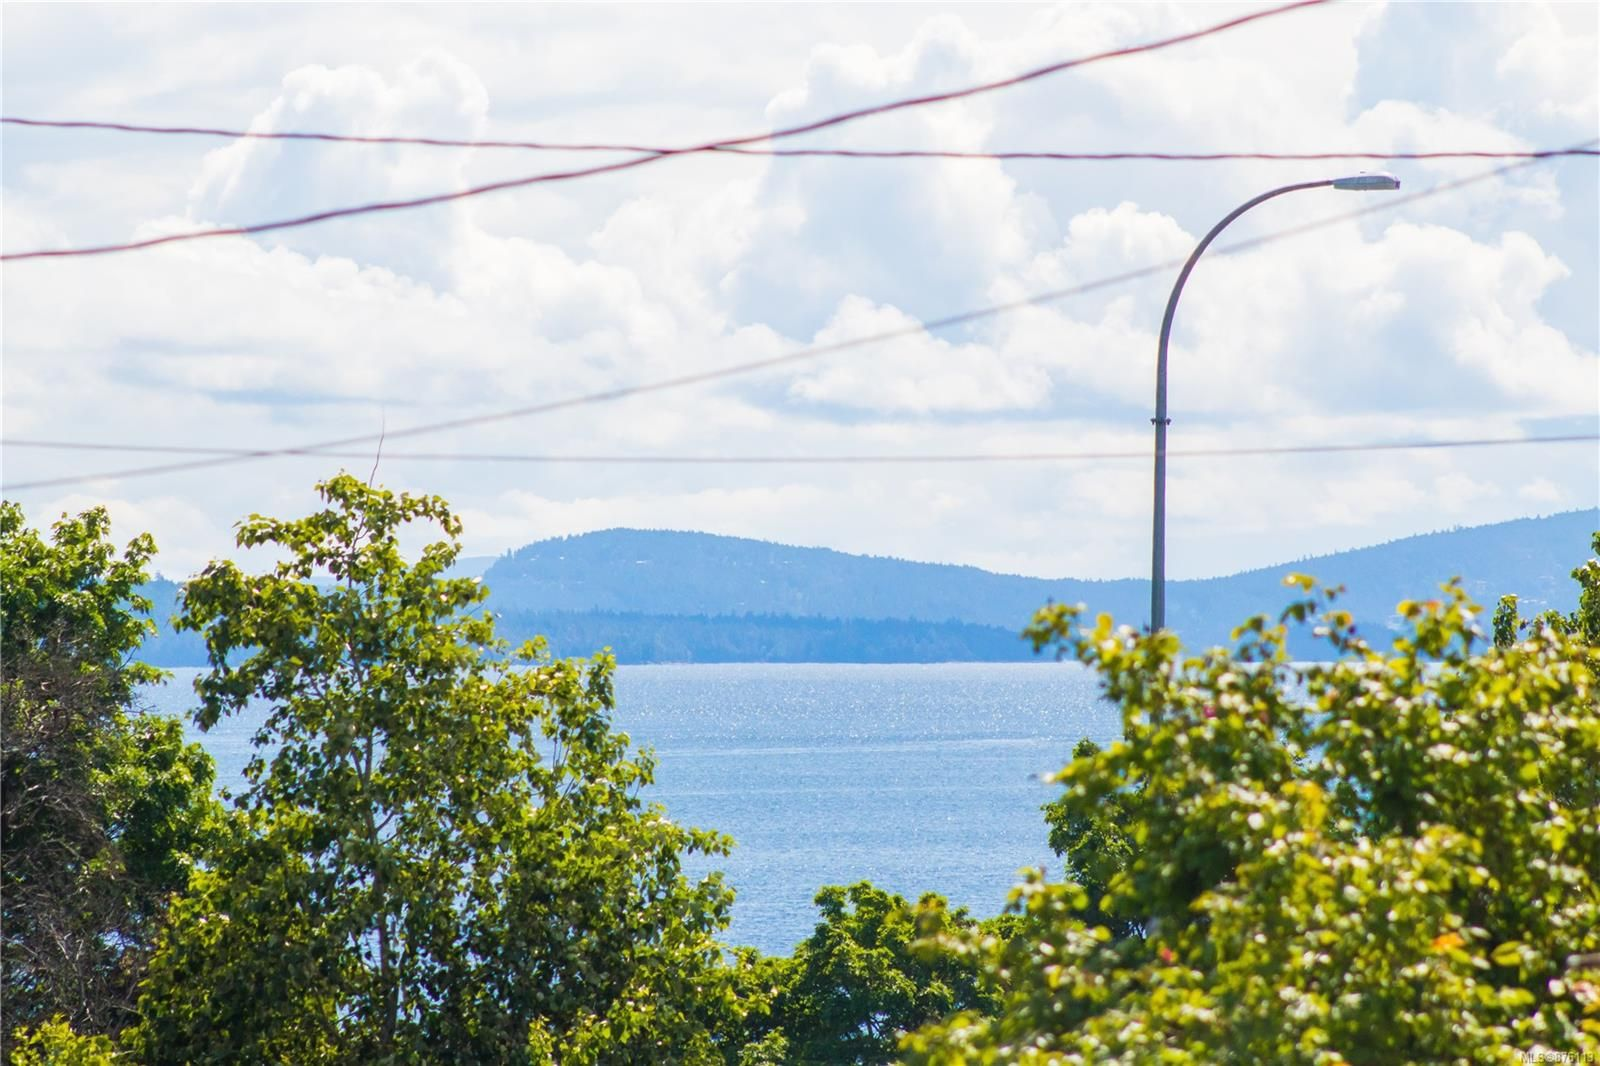 Main Photo: 110 Esplanade Ave in : Du Ladysmith Multi Family for sale (Duncan)  : MLS®# 876113